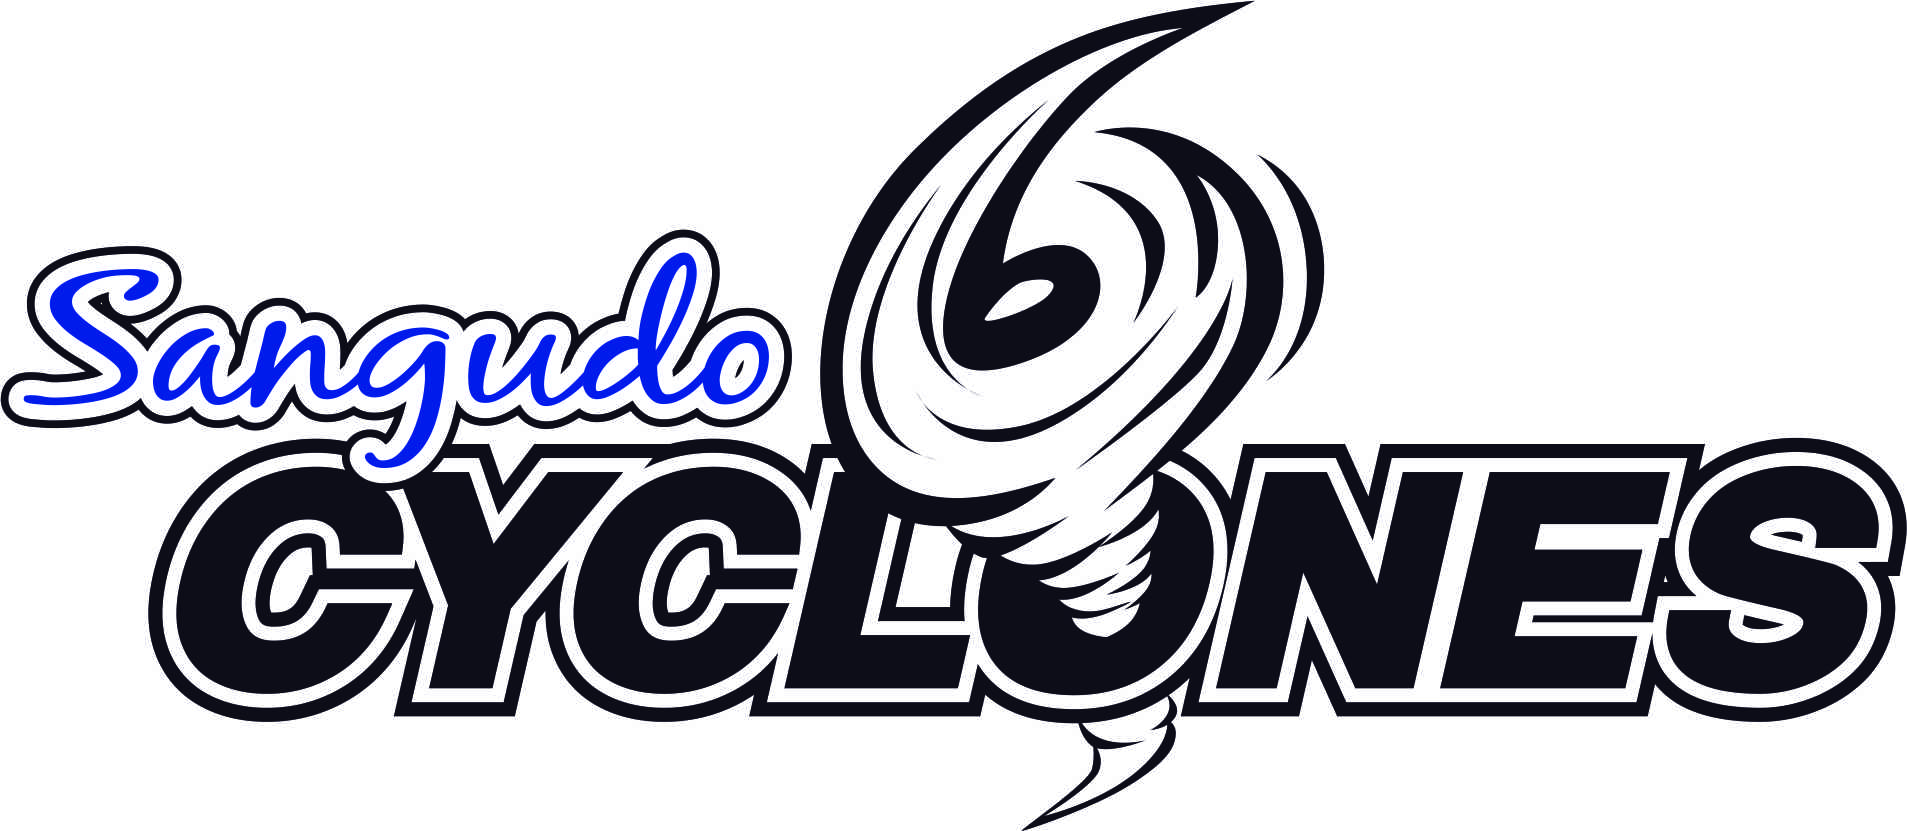 Sangudo Minor Sports : Website by RAMP InterActive